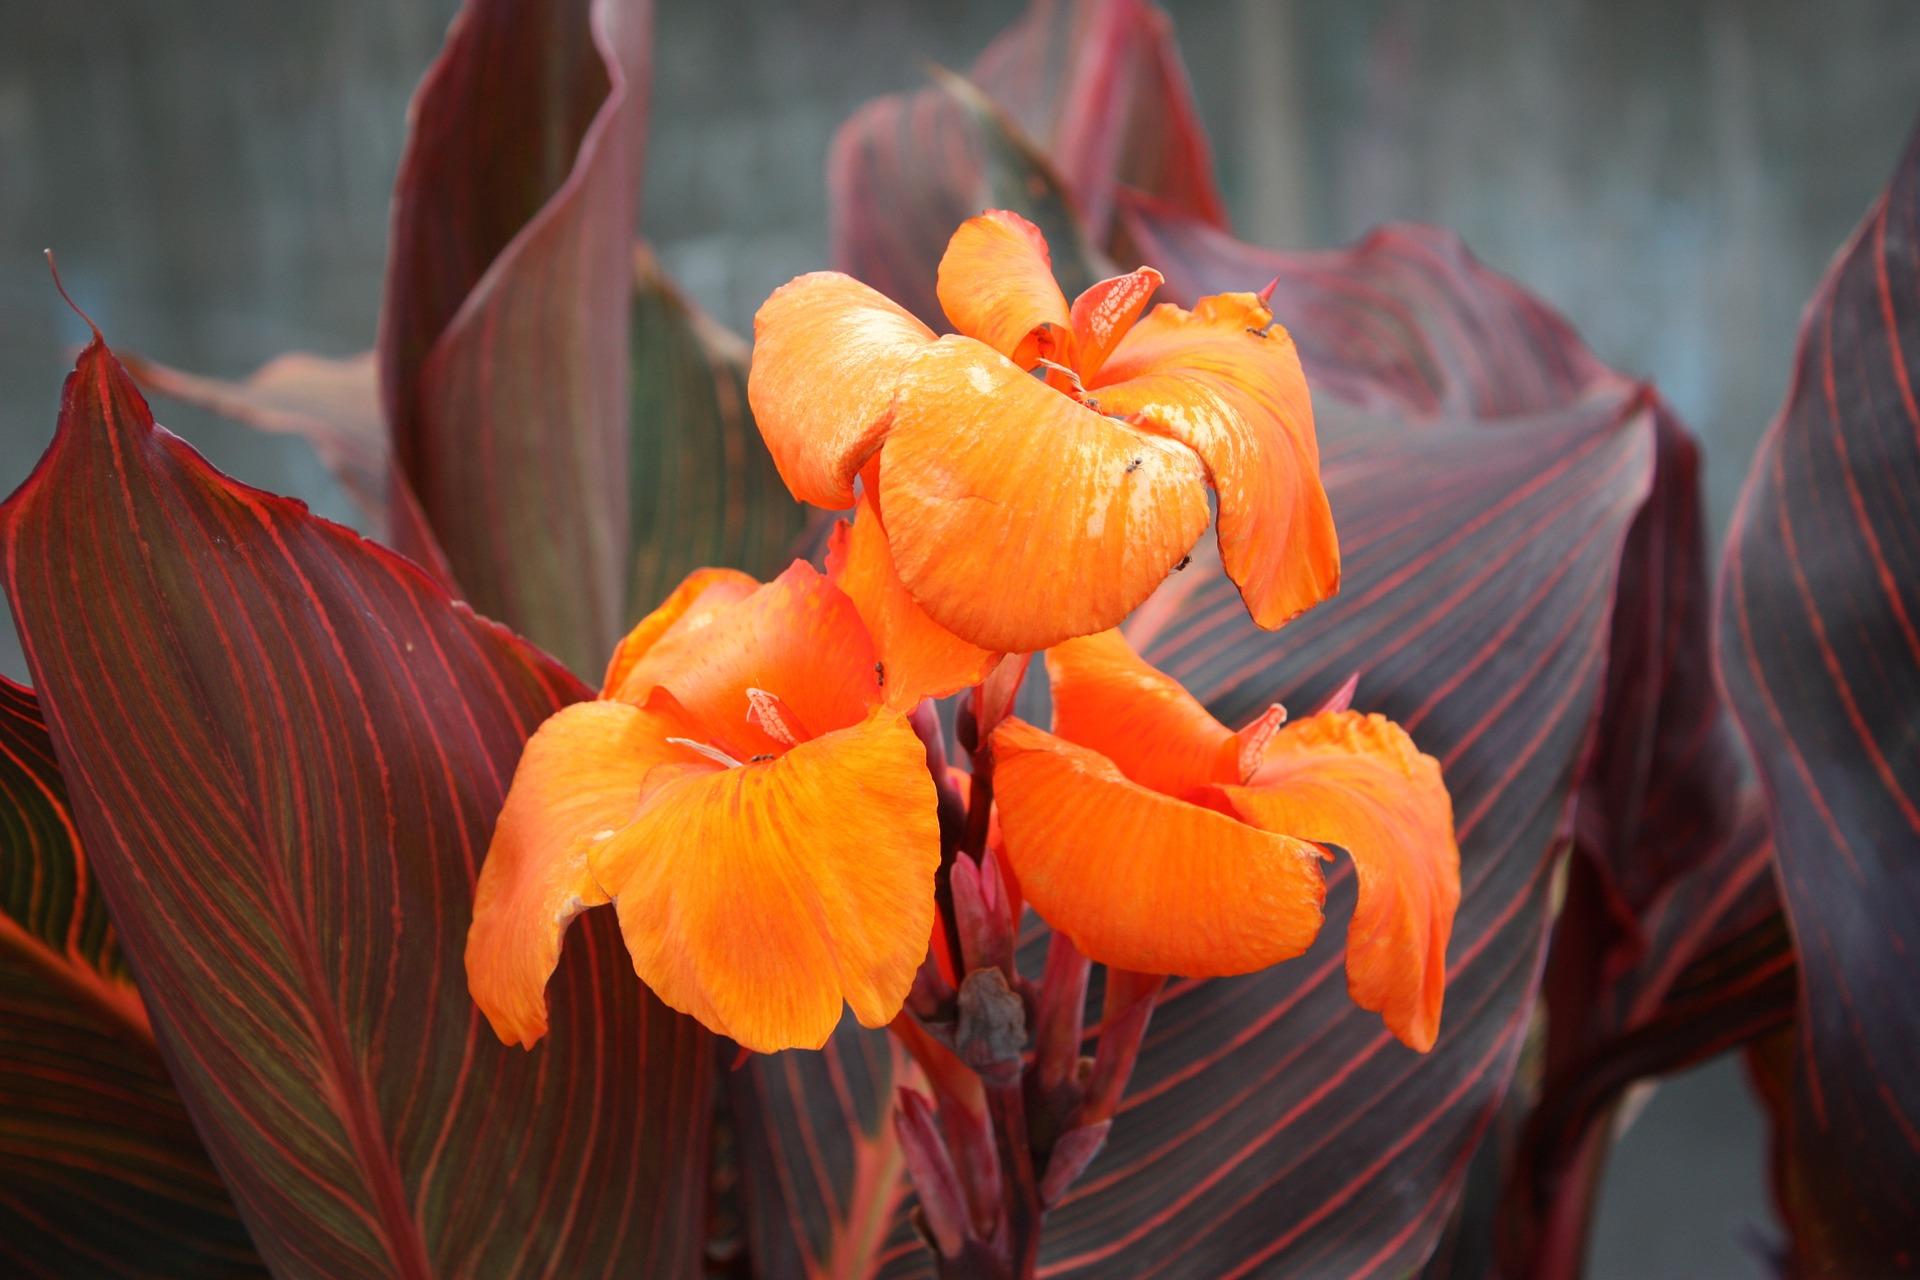 canna lily pixabay.jpg